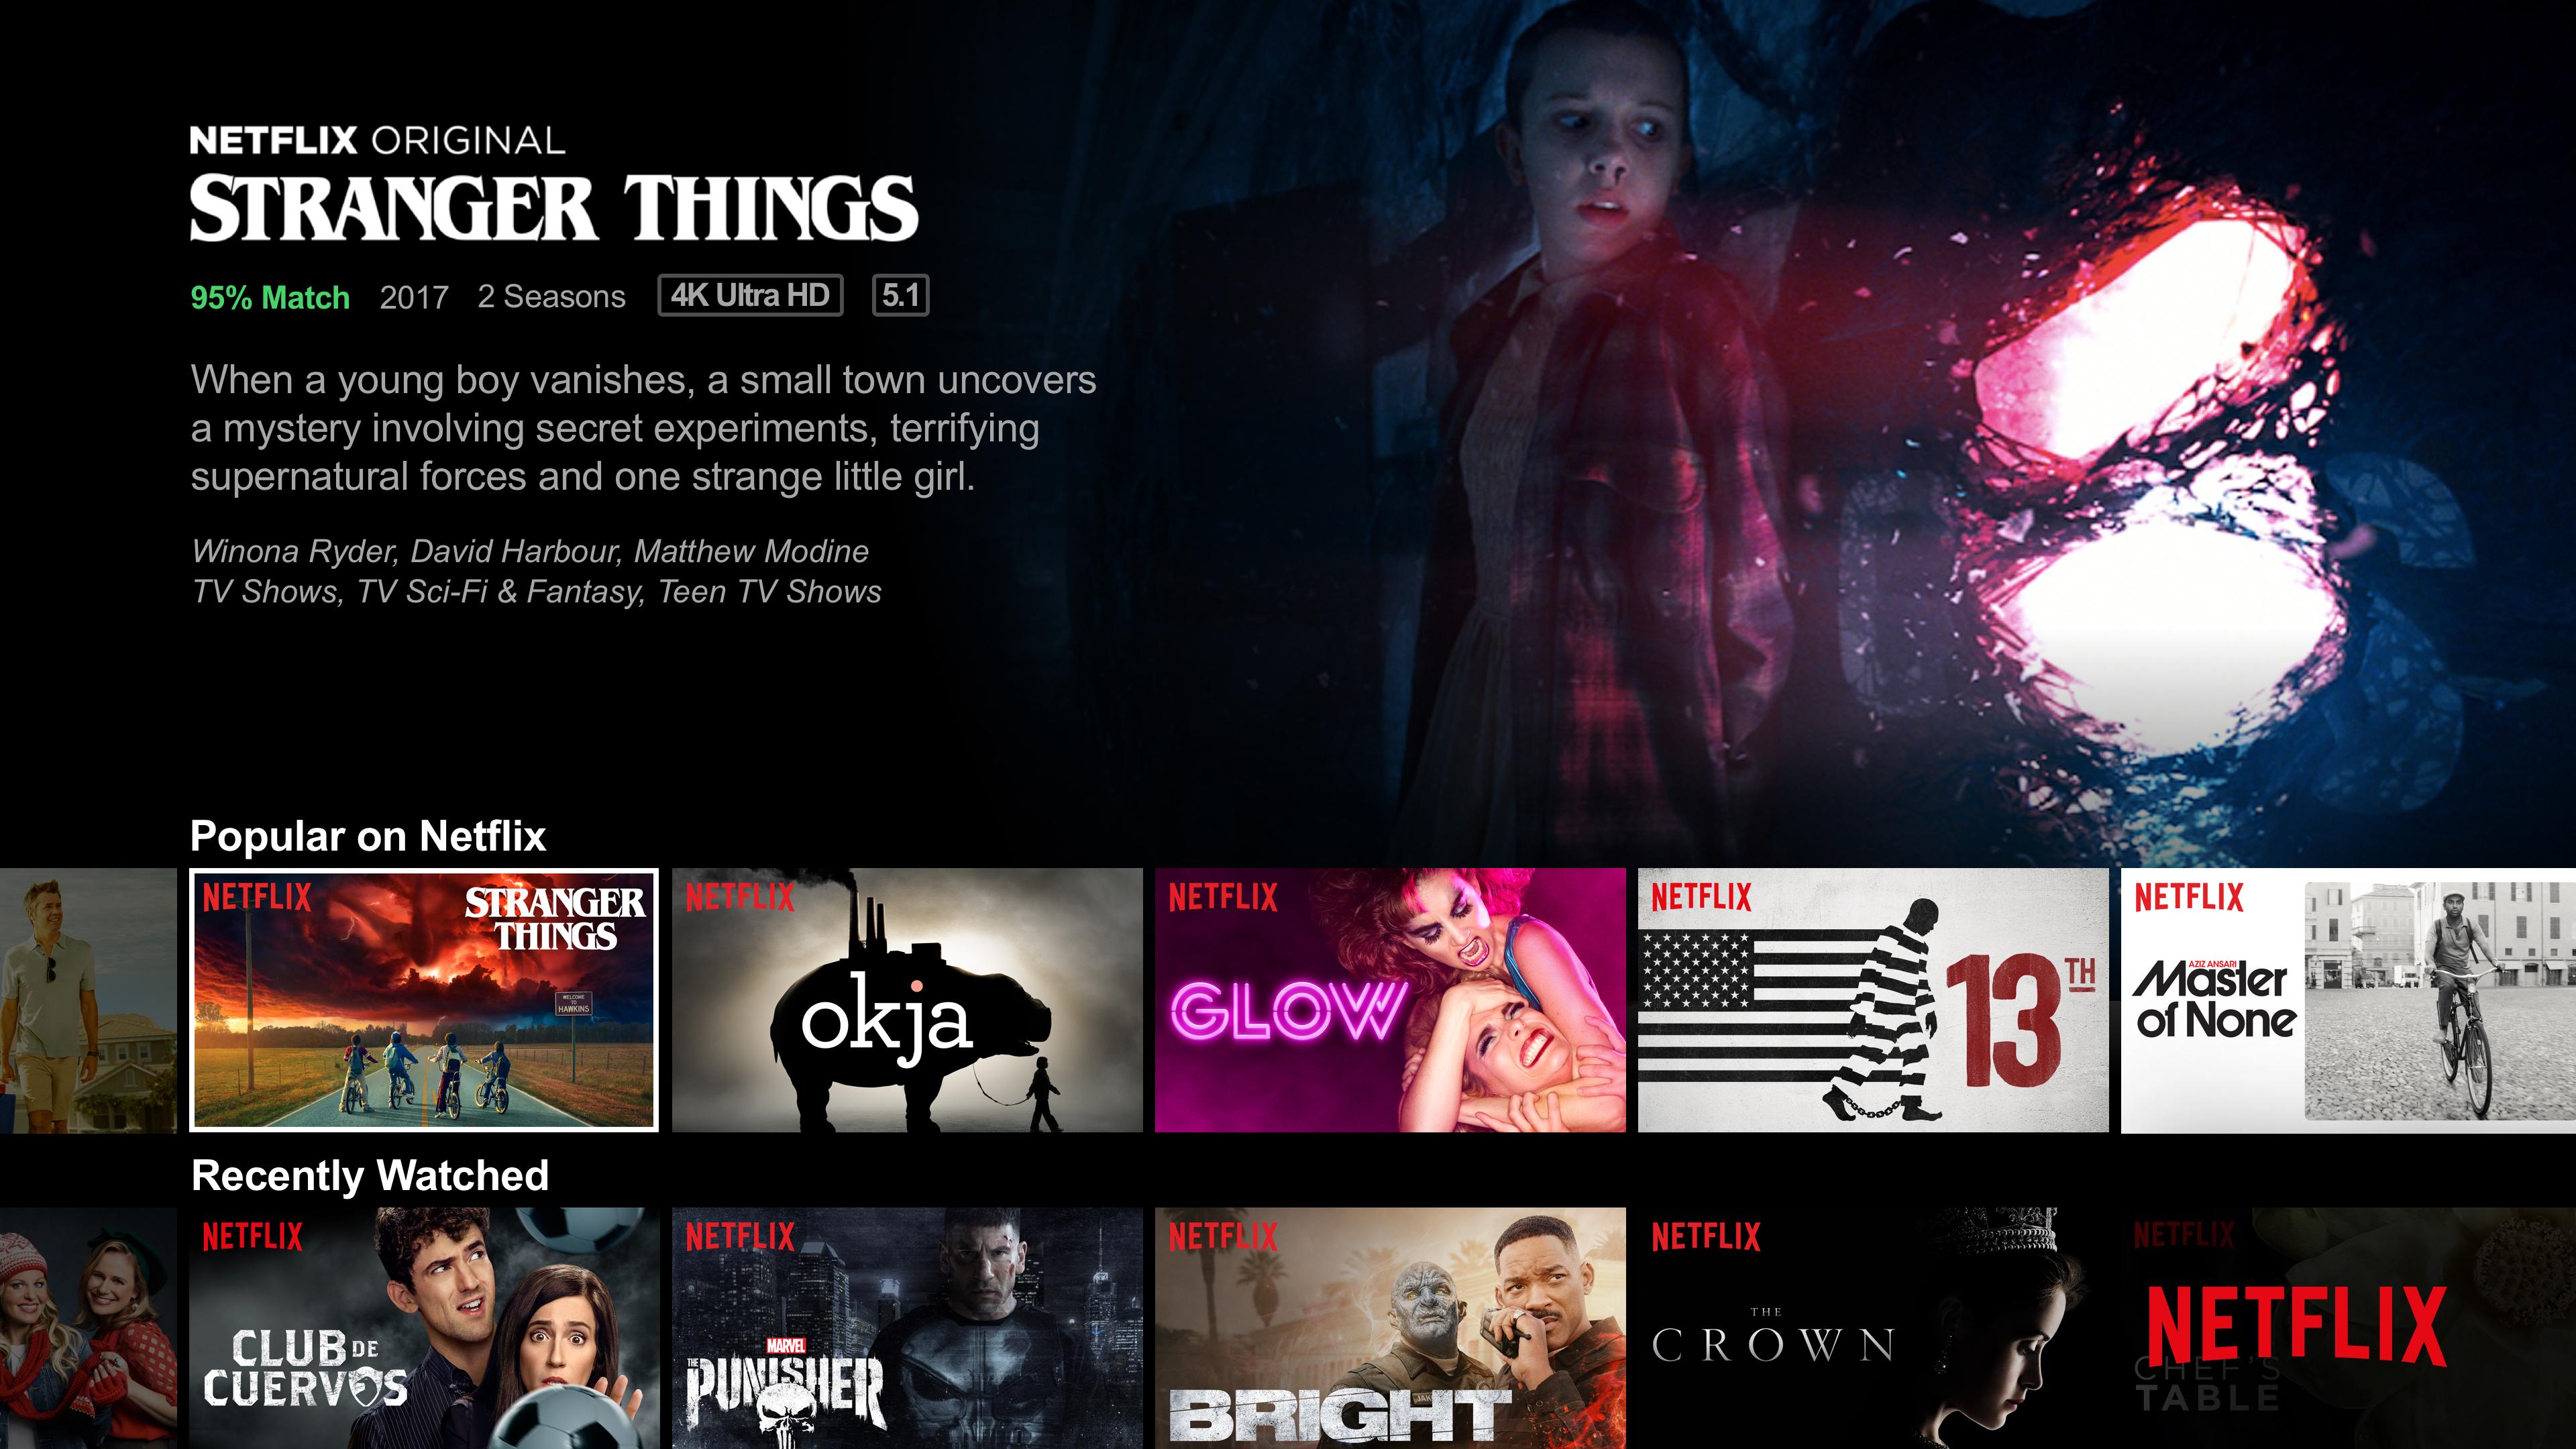 Consumer Goods Streaming Media Netflix NFLX Content Screen